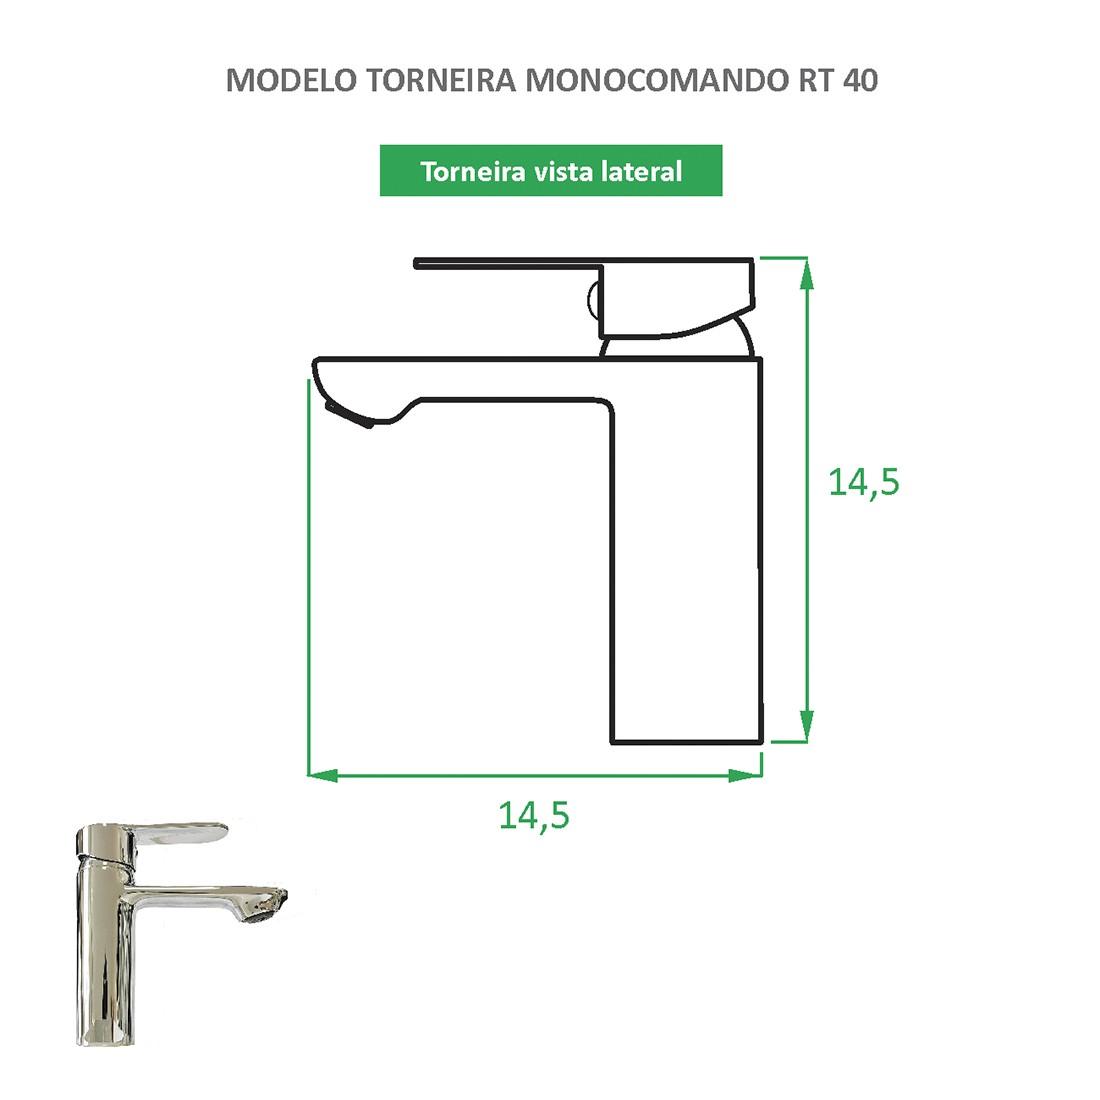 Torneira Monocomando Quadrada RT 40